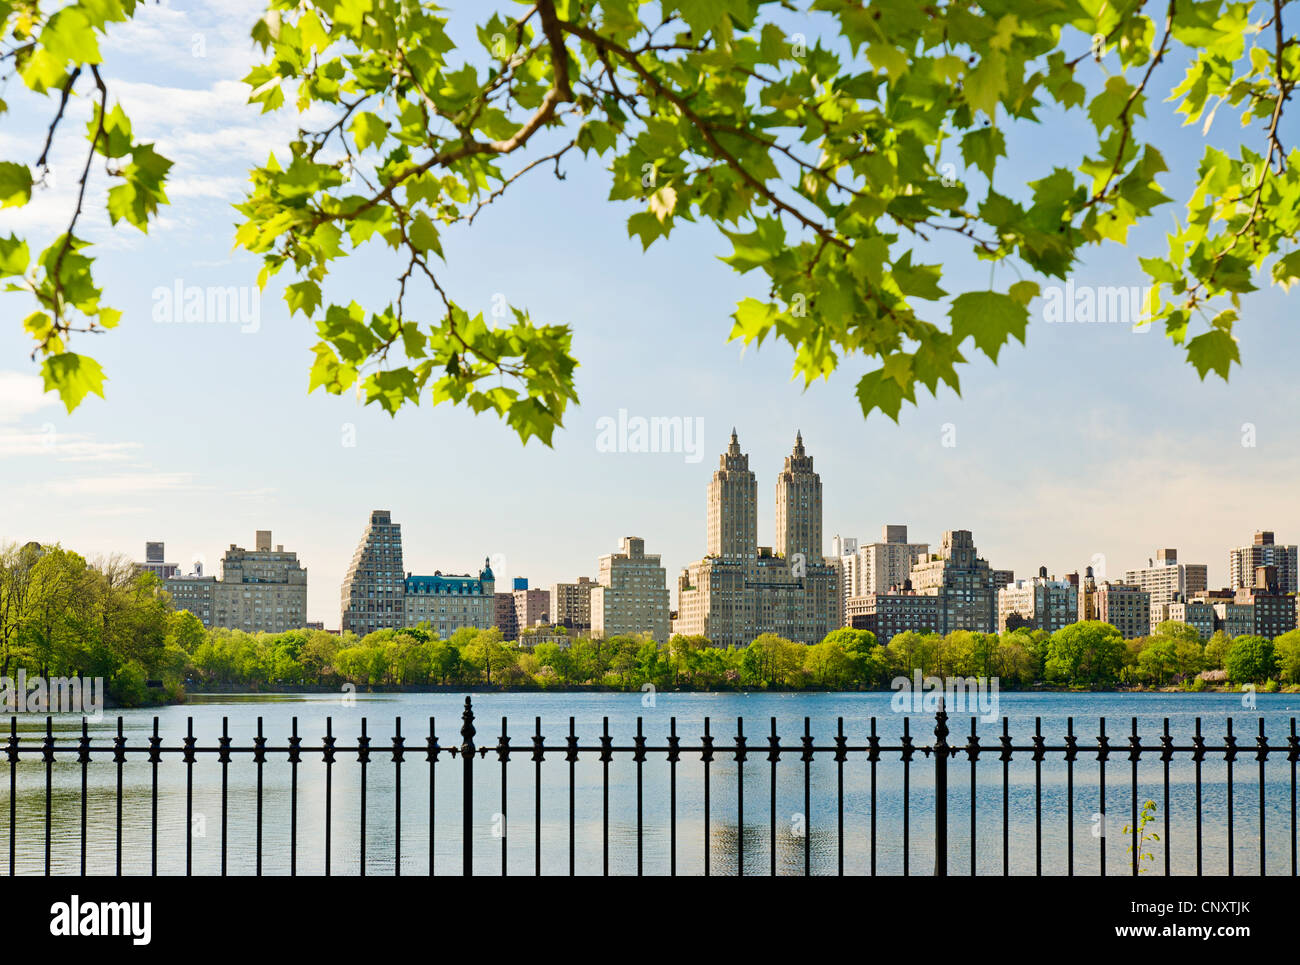 Jacqeuline Kennedy Onassis Reservoir, Central Park - Stock Image